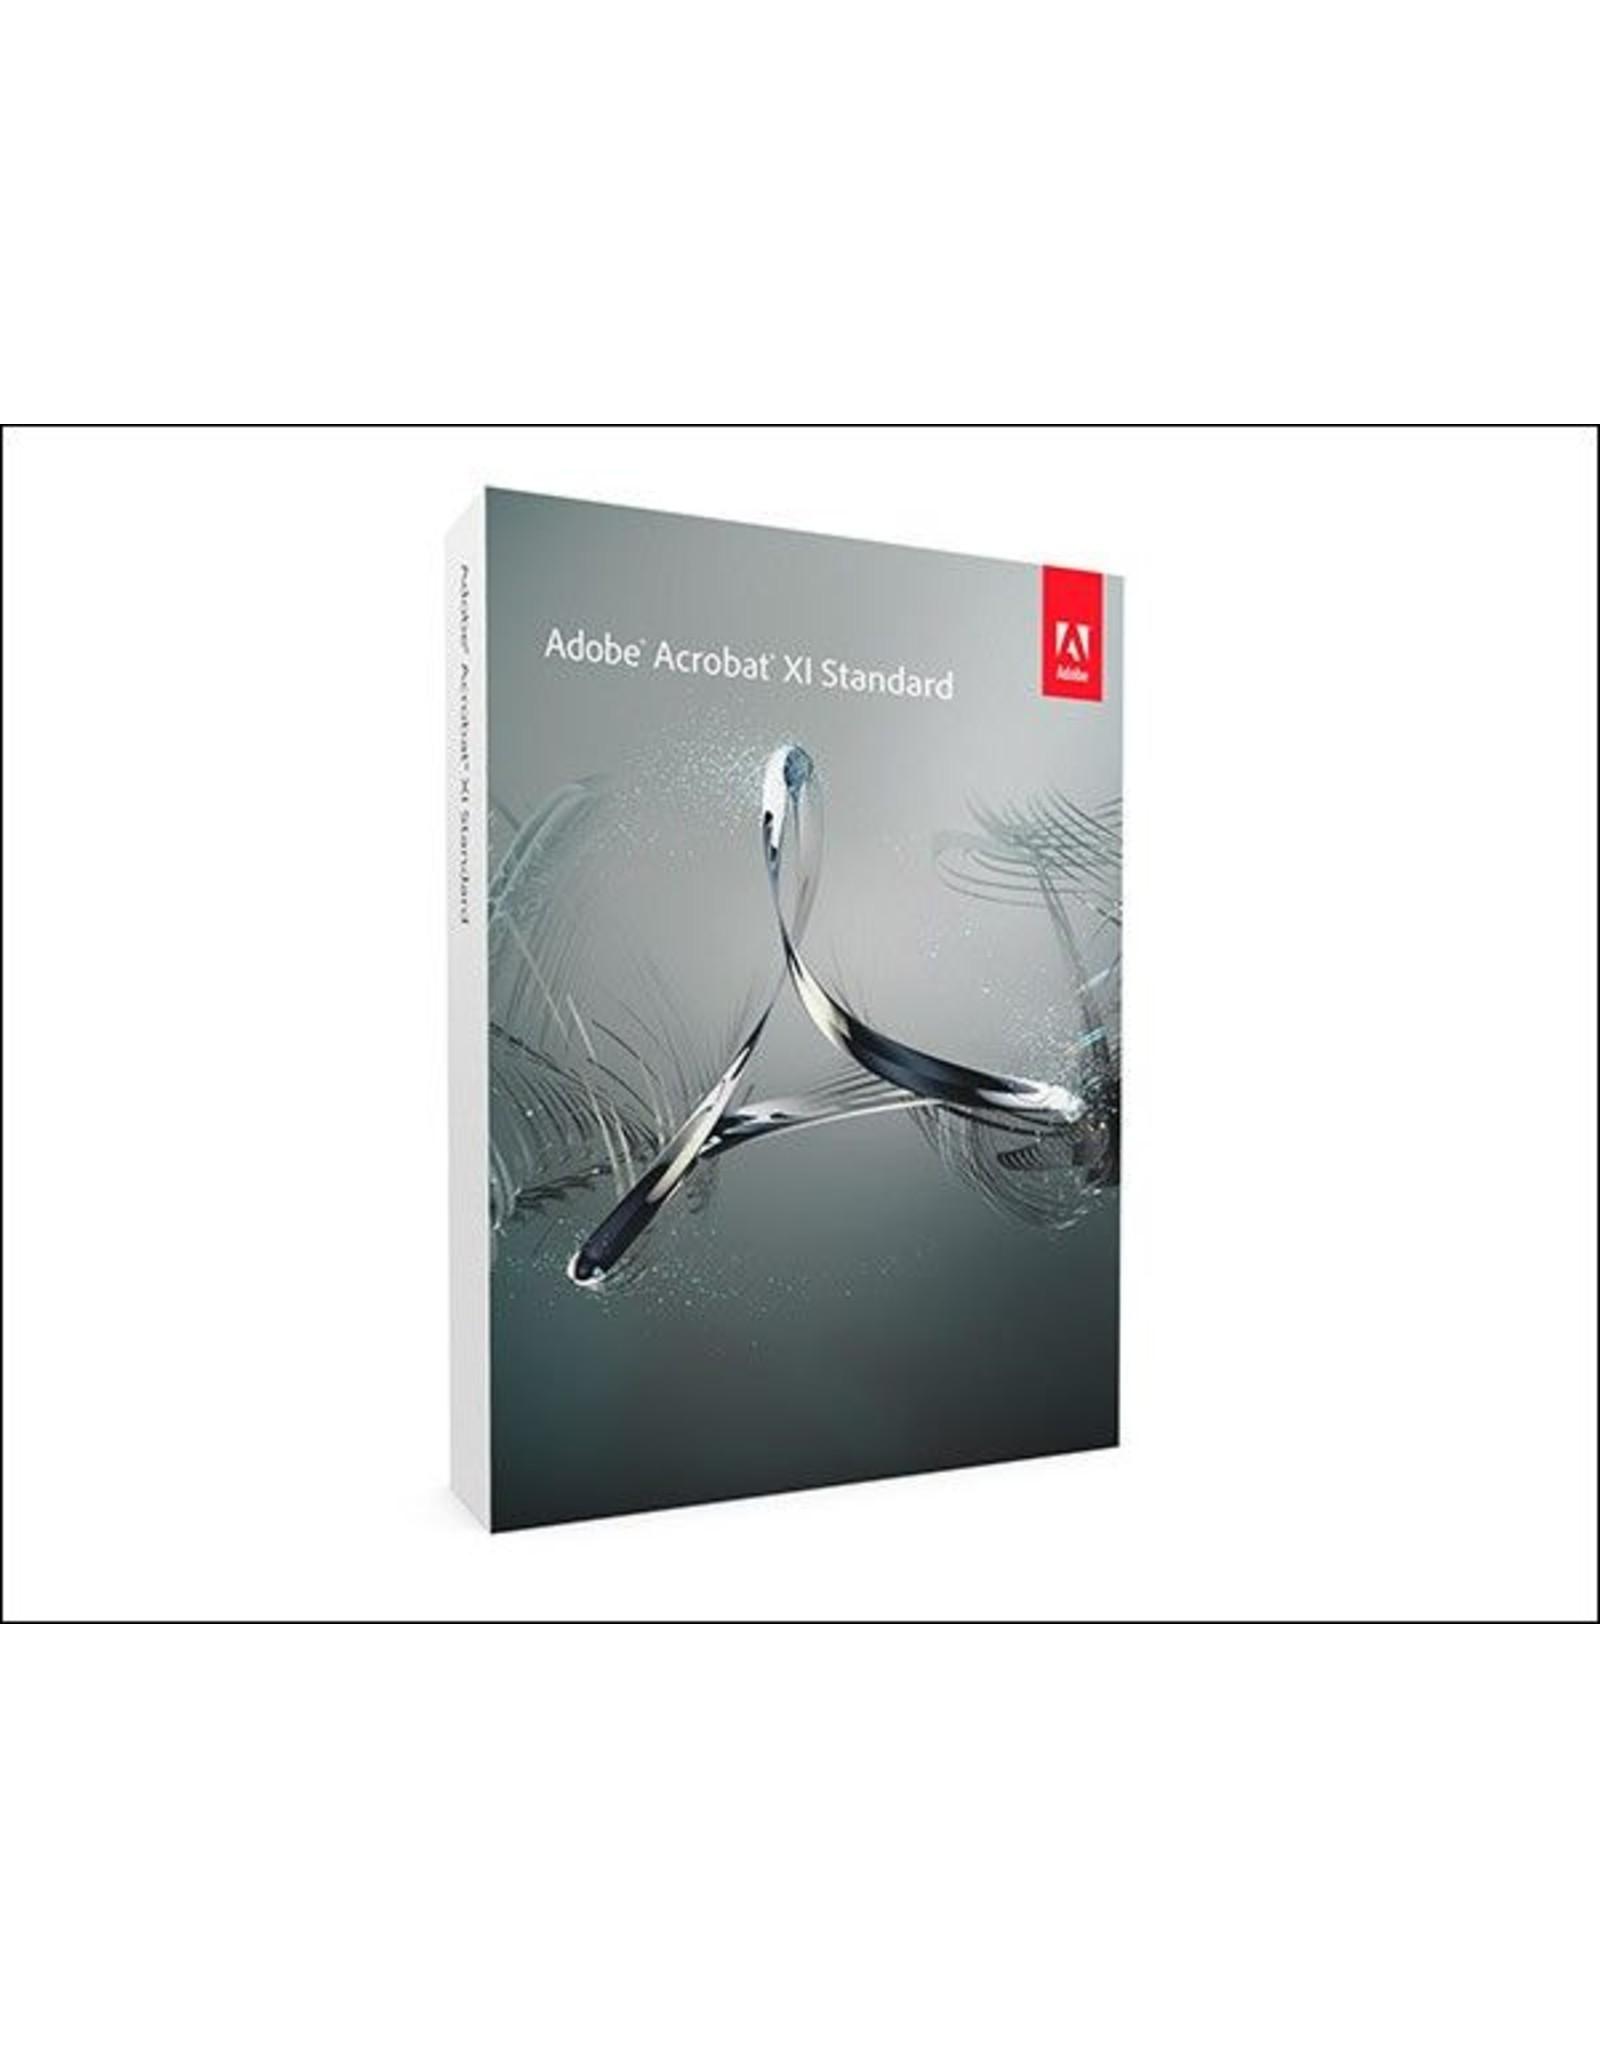 Adobe Adobe Acrobat XI Standard for PC